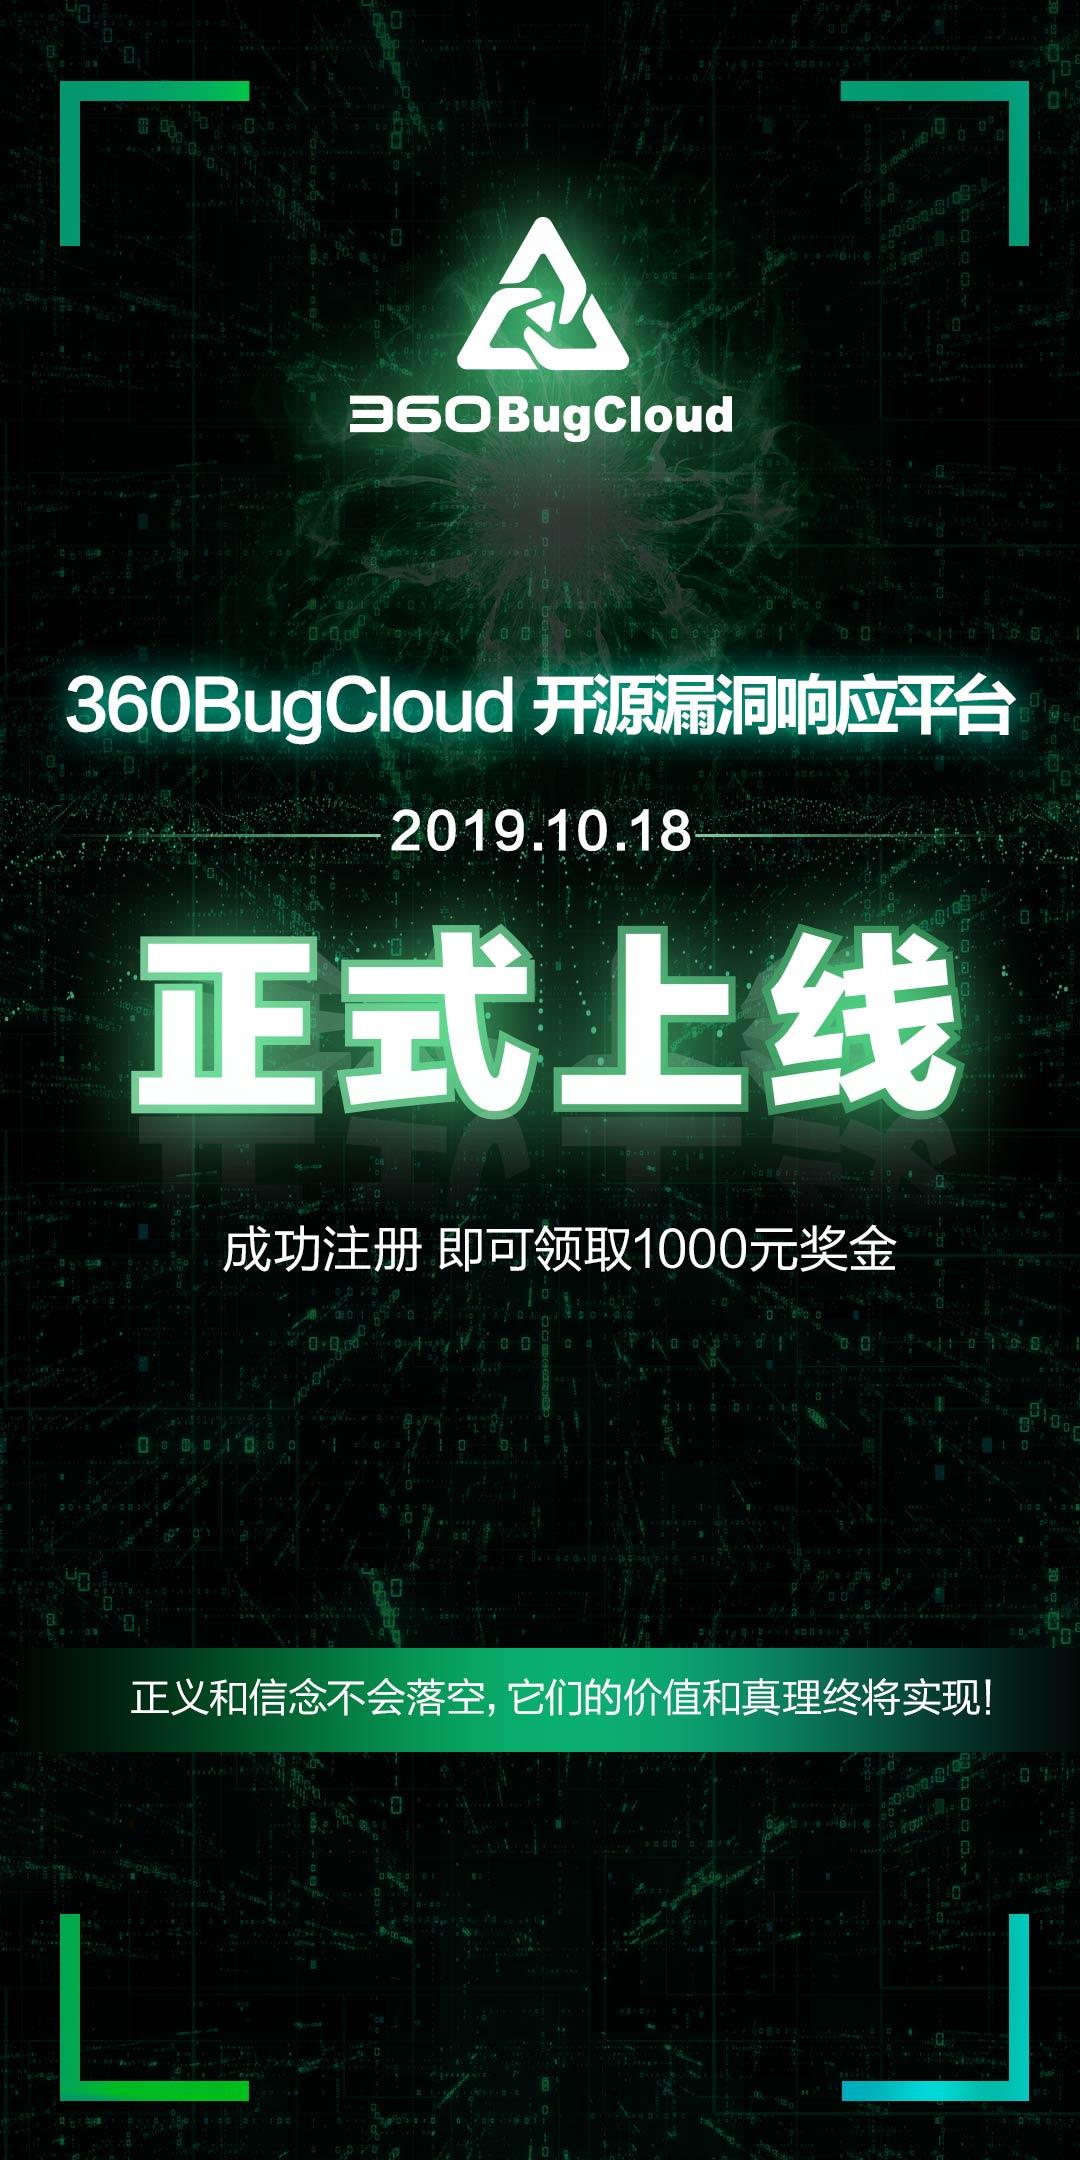 360BugCloud上线.jpg